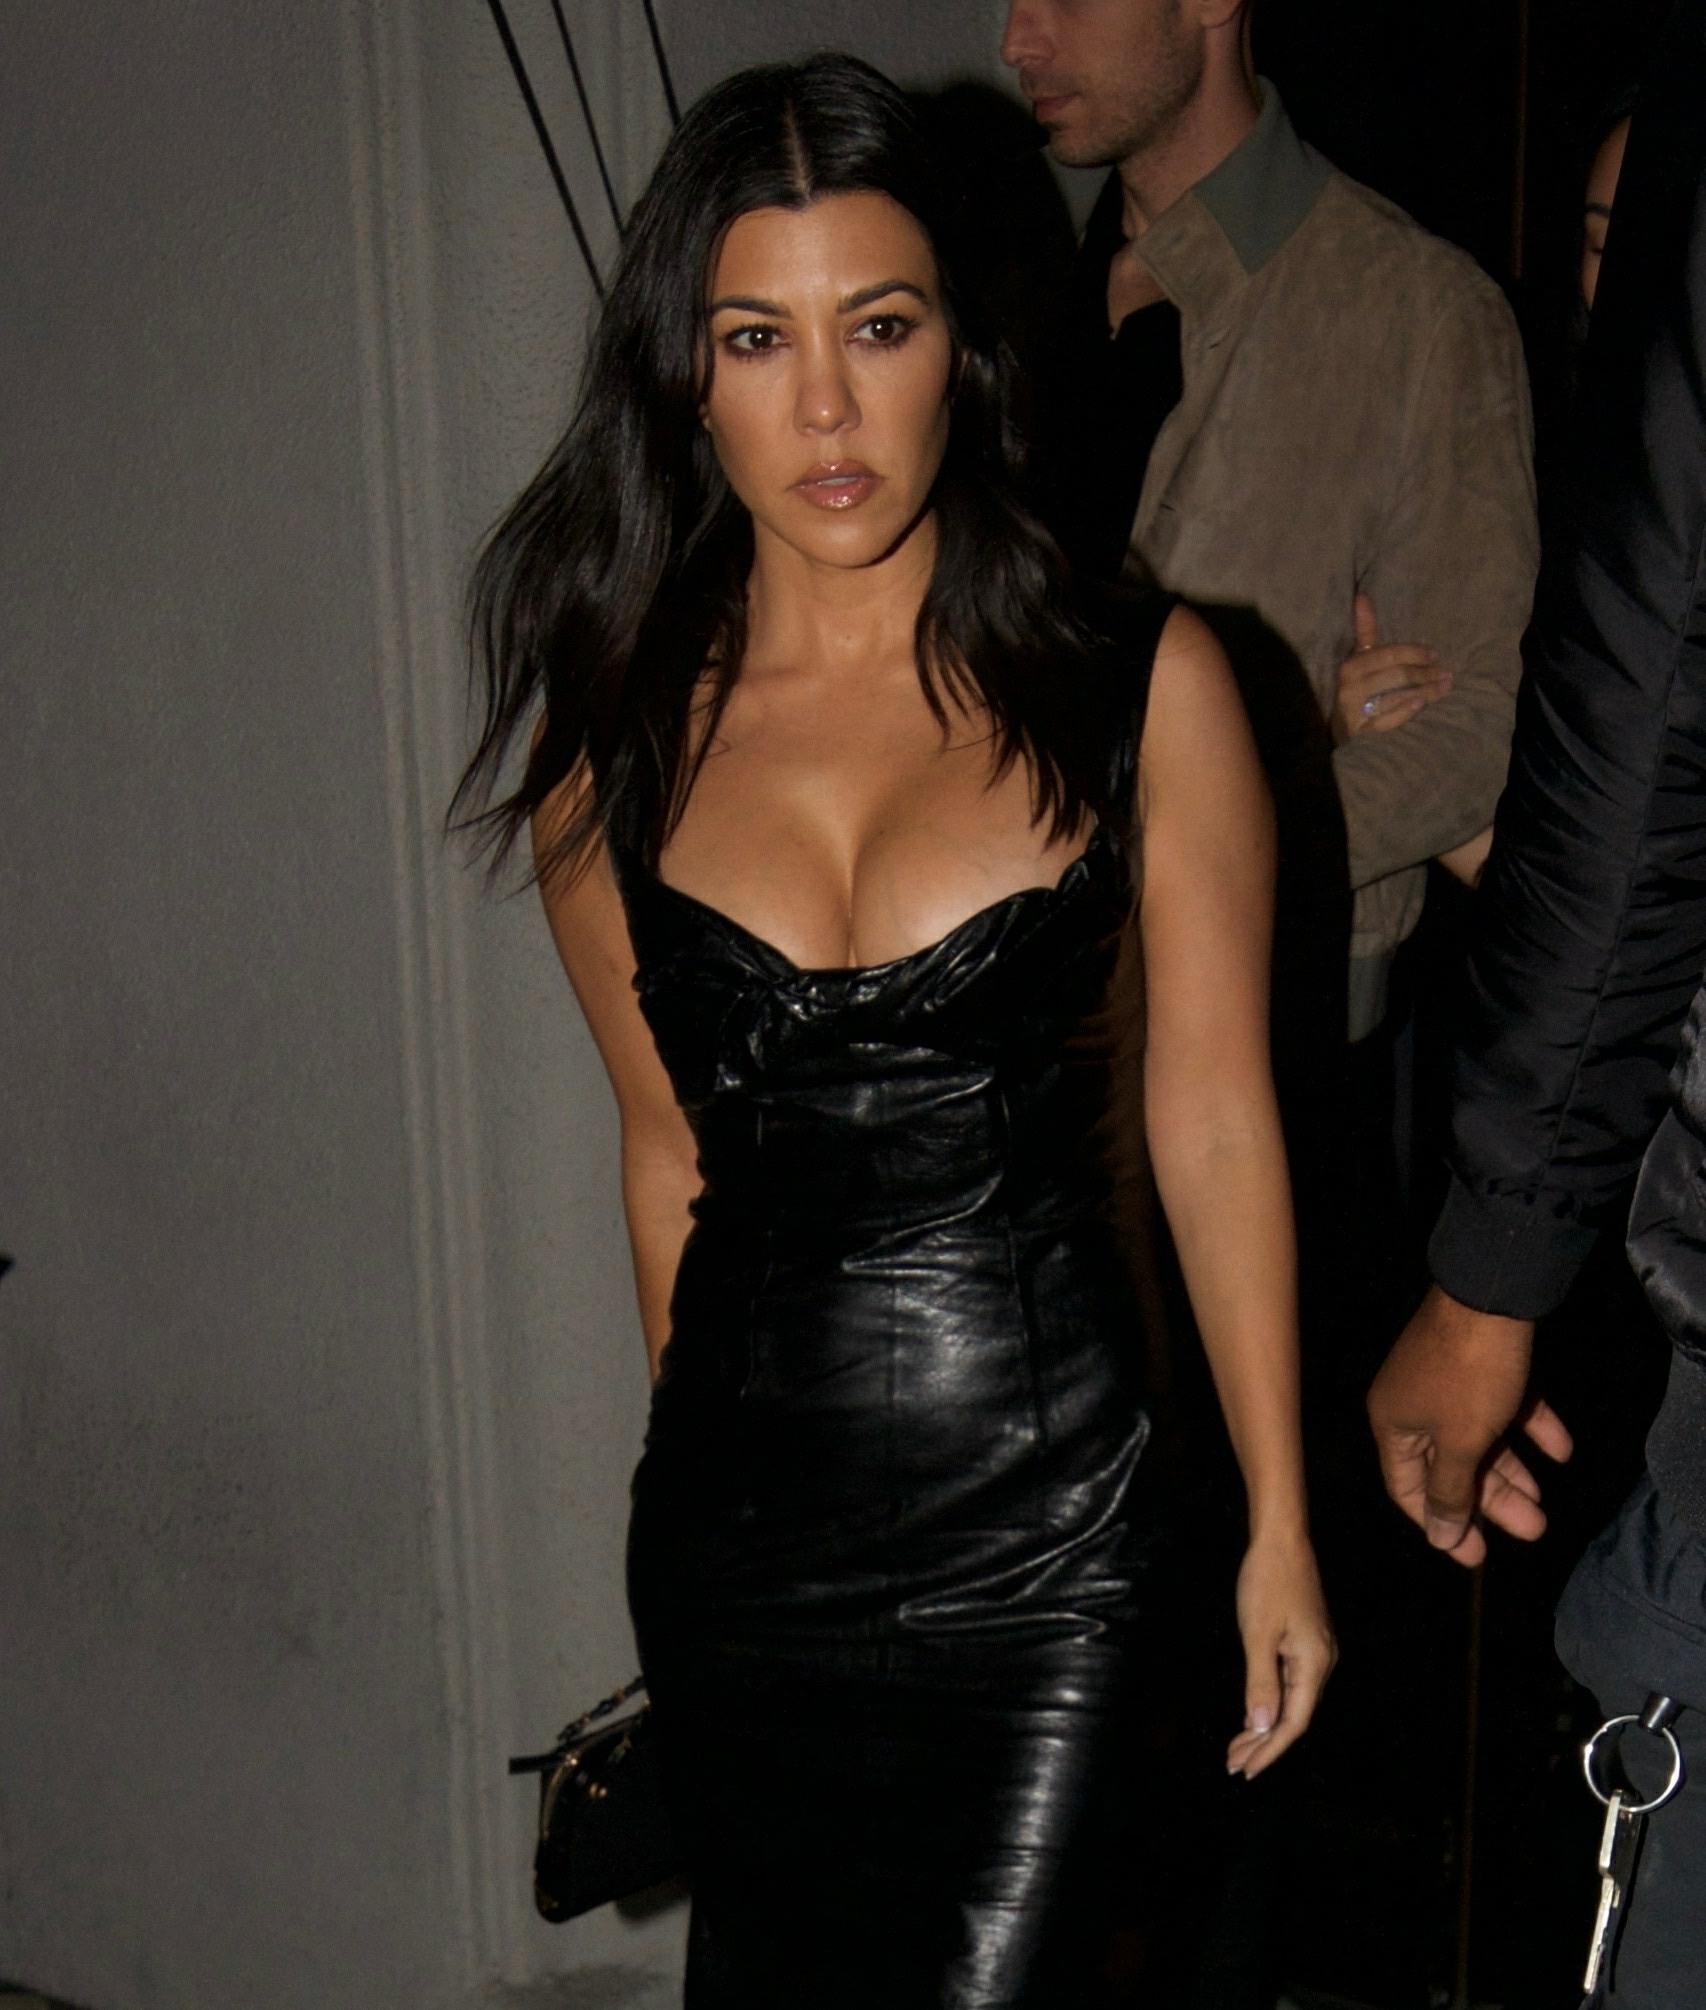 Kourtney Kardashian makes a stylish exit with BFF Stephanie Shepherd from dinner at Craig's